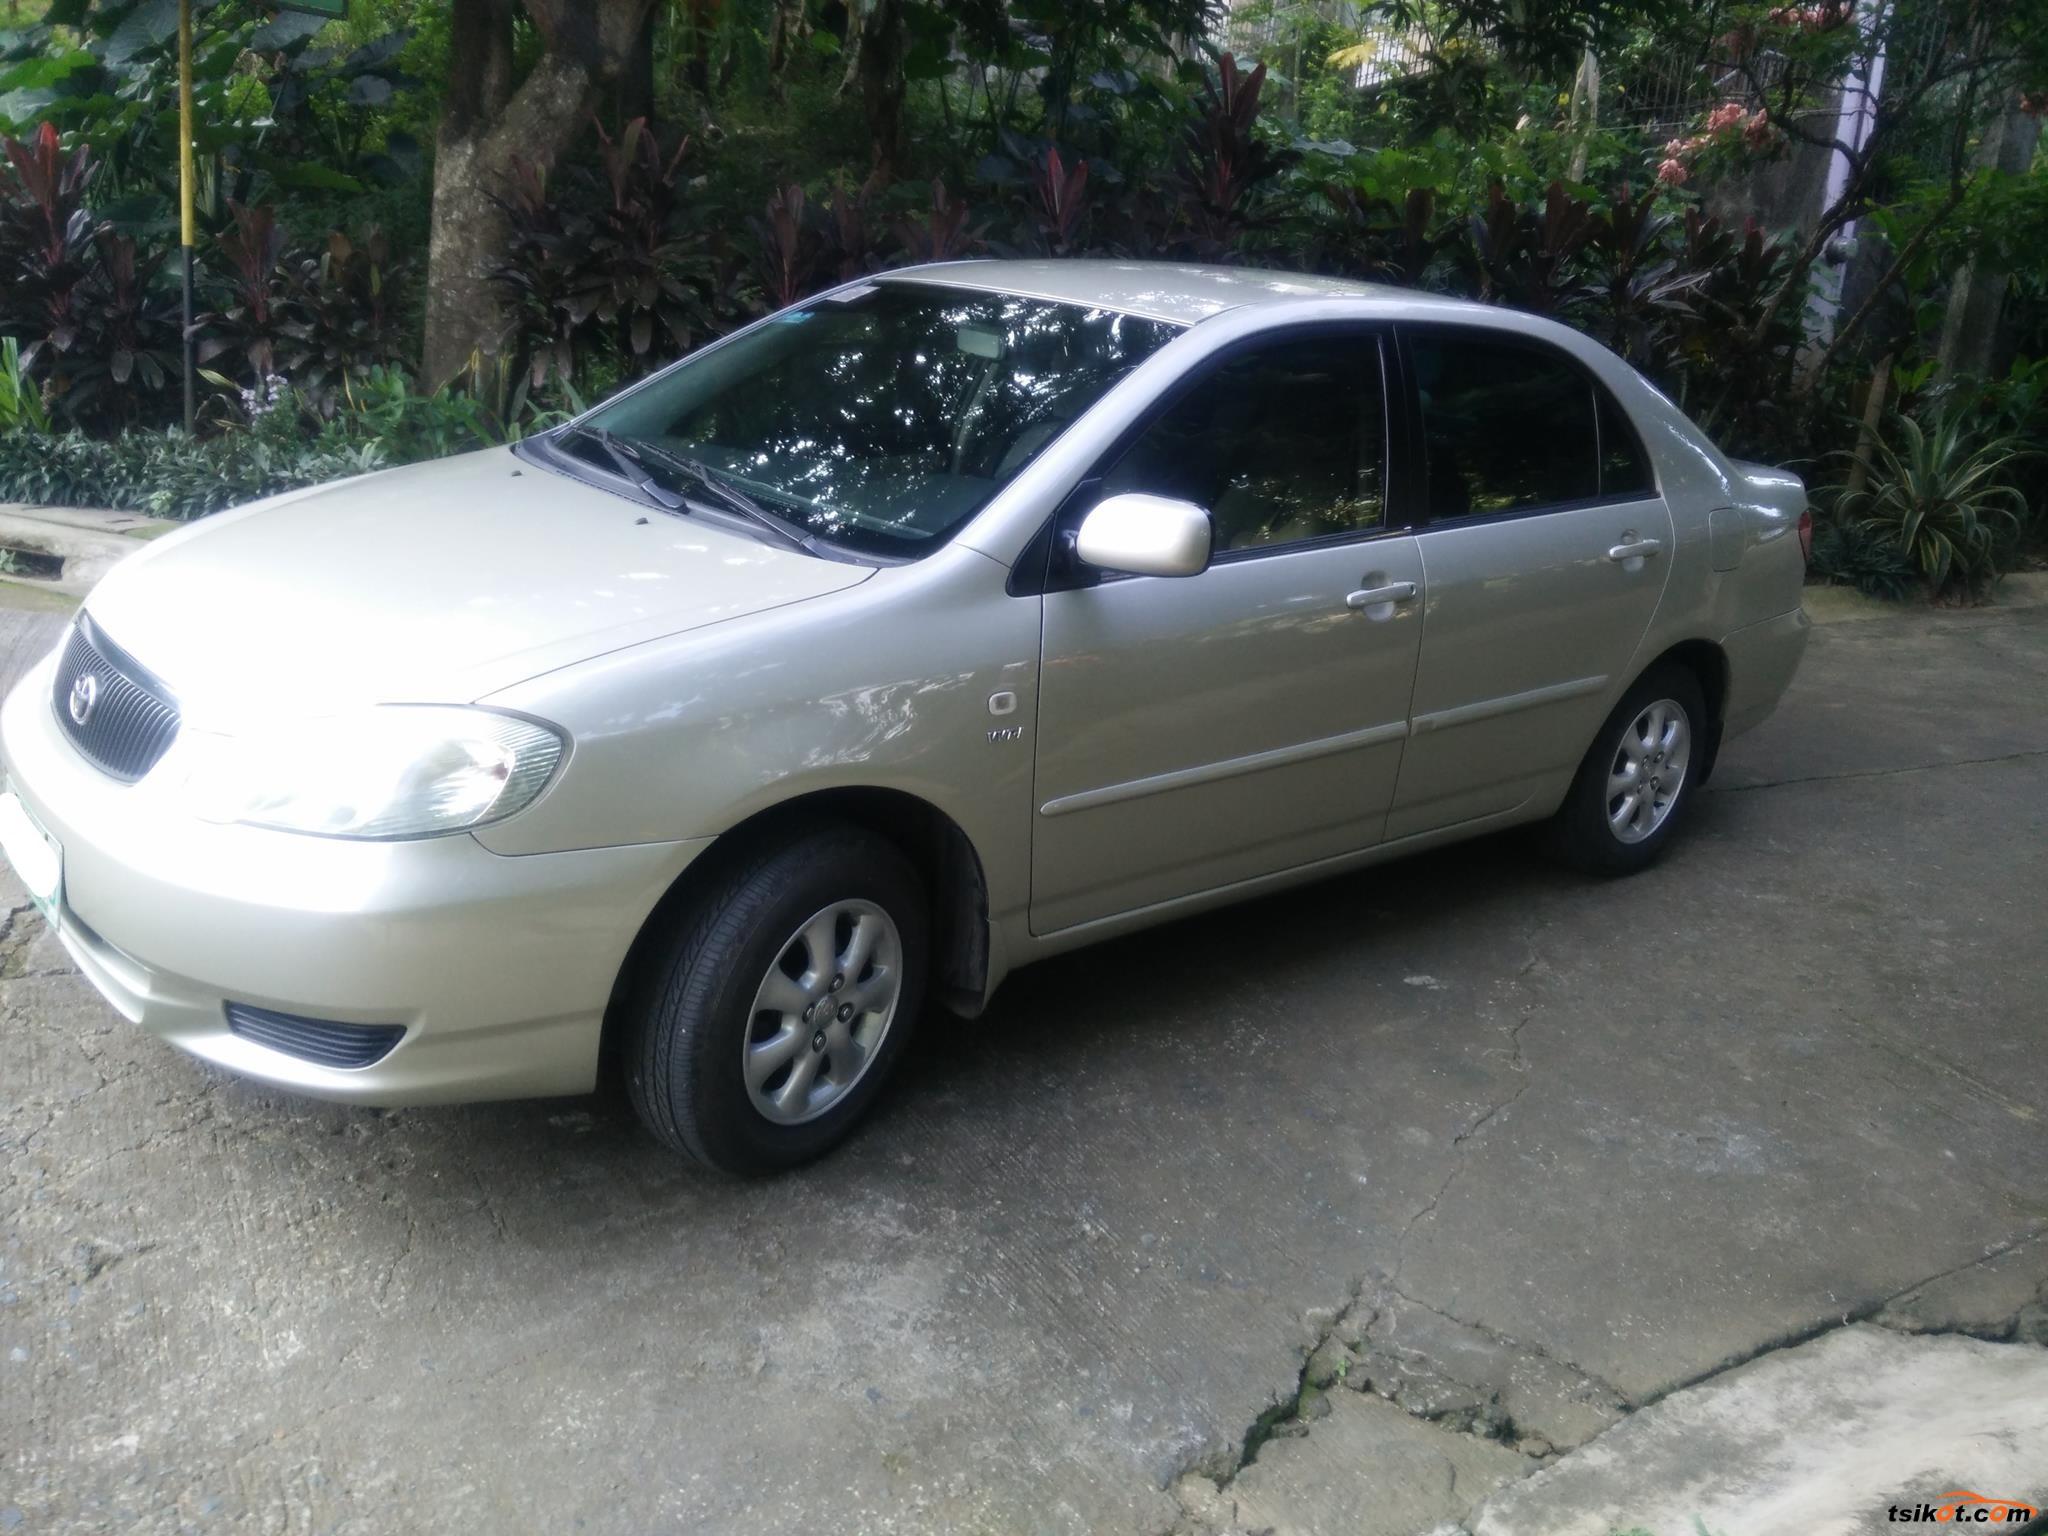 Toyota Corolla 2002 - 6